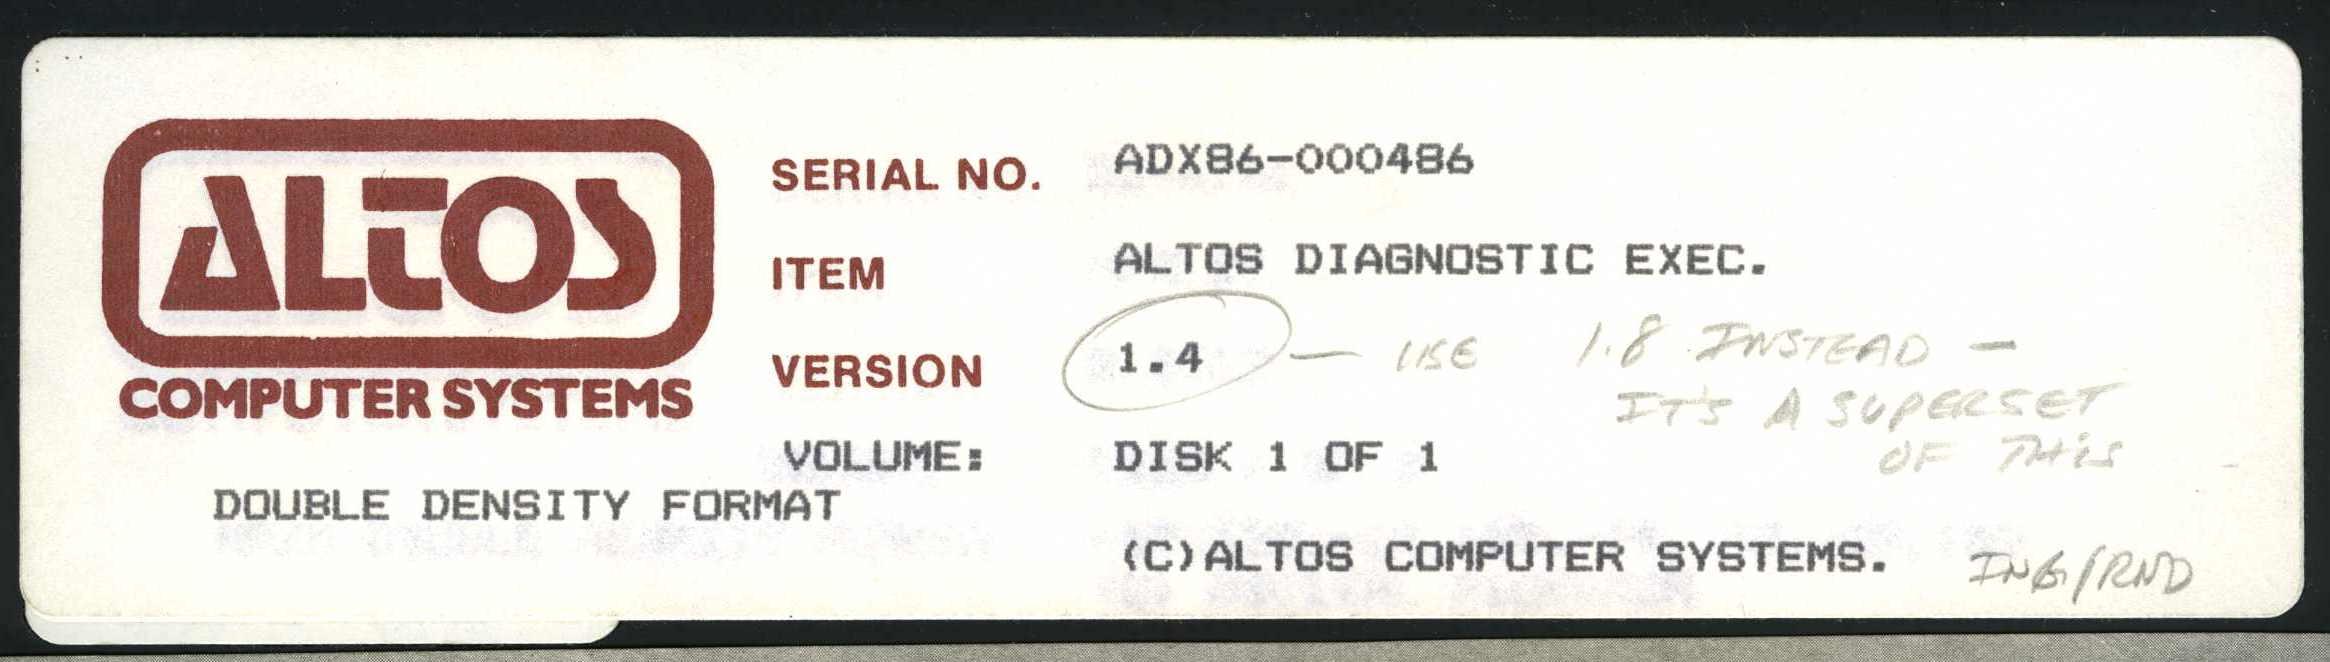 Index of /bits/Altos/8600/8600_Floppy_Images_Aug2017/ADX